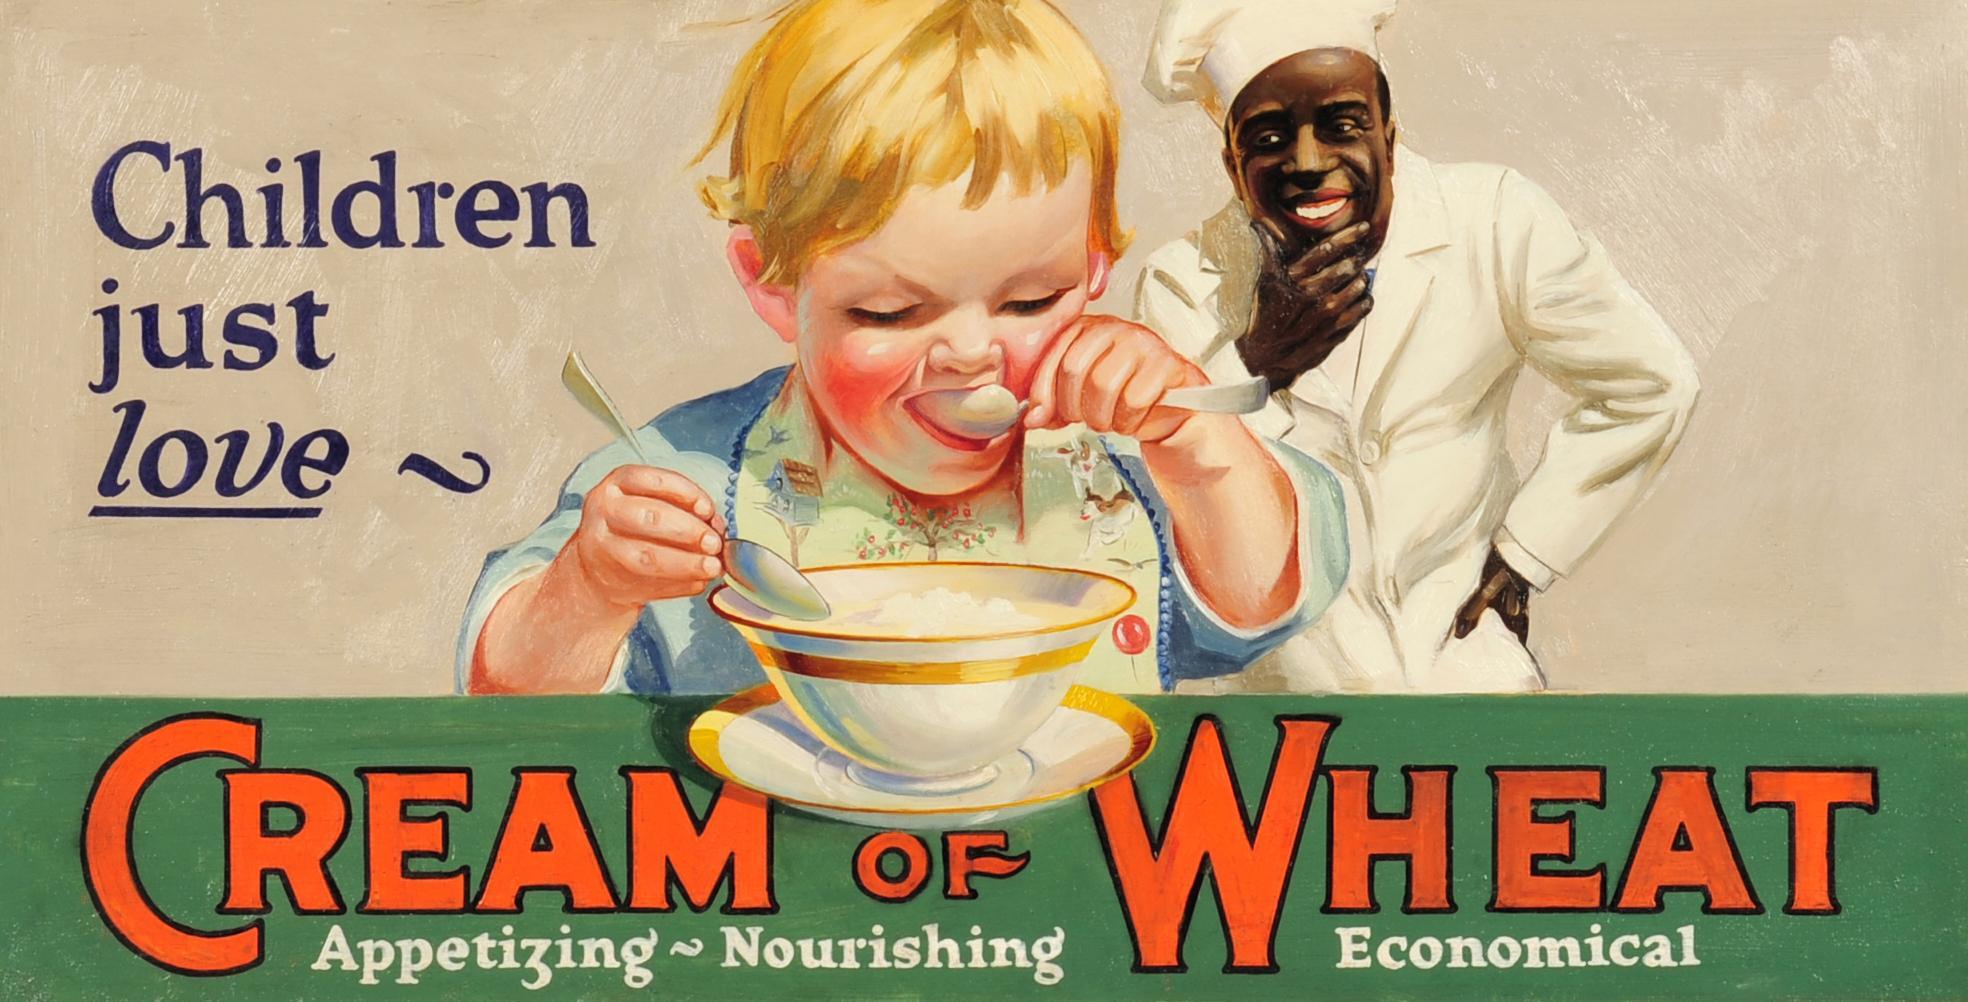 1925 Cream of Wheat Ad